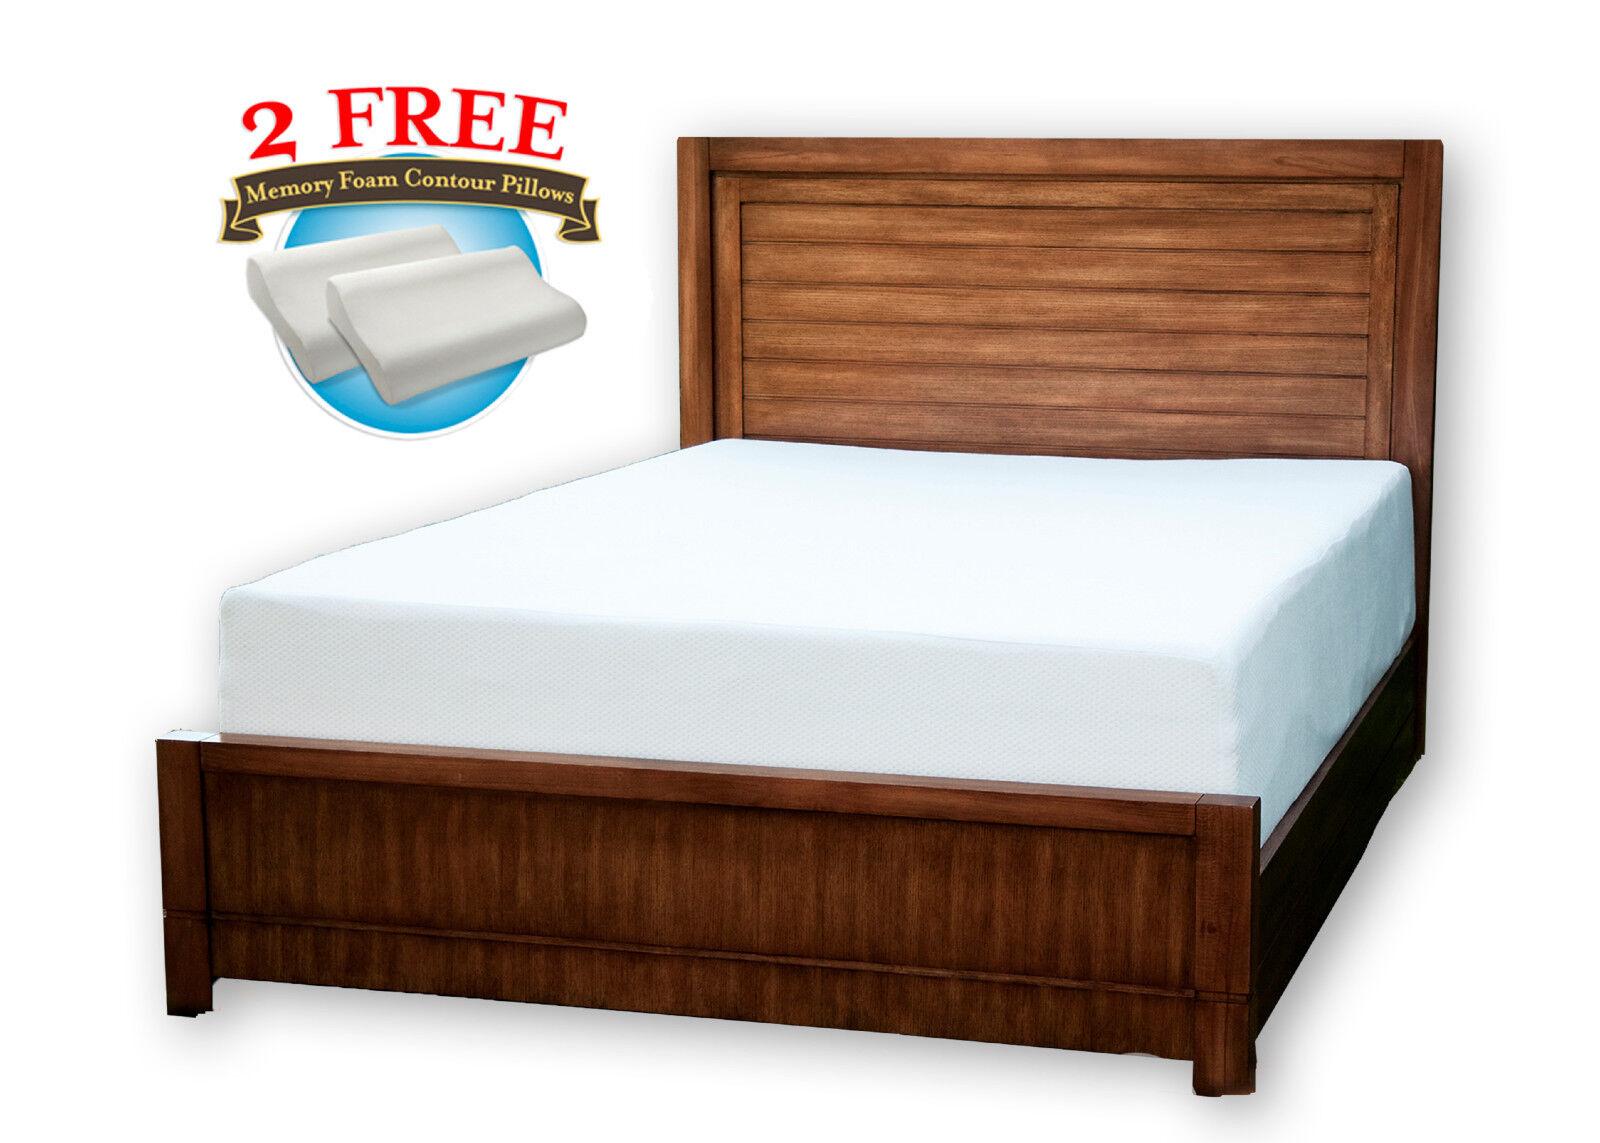 extra long twin mattress - 10 inch cool medium memory foam mattress twin, xl,  full, queen, king, cal king